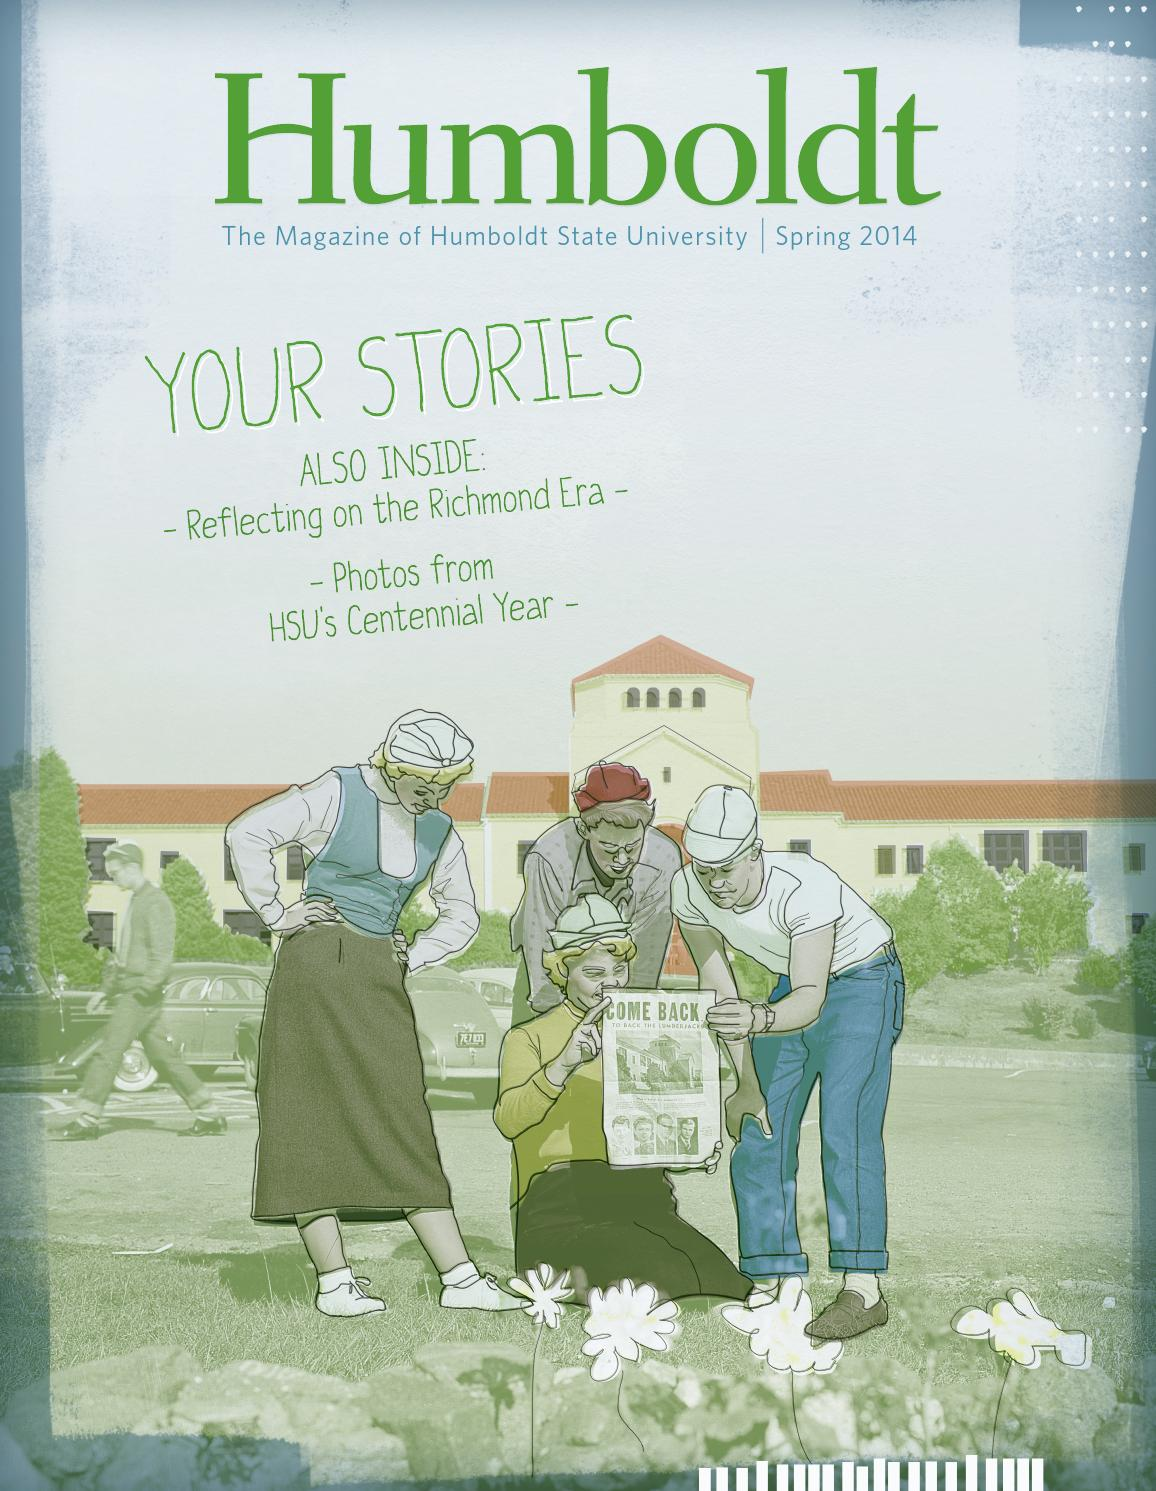 Humboldt Magazine Spring 2014 By Humboldt State University